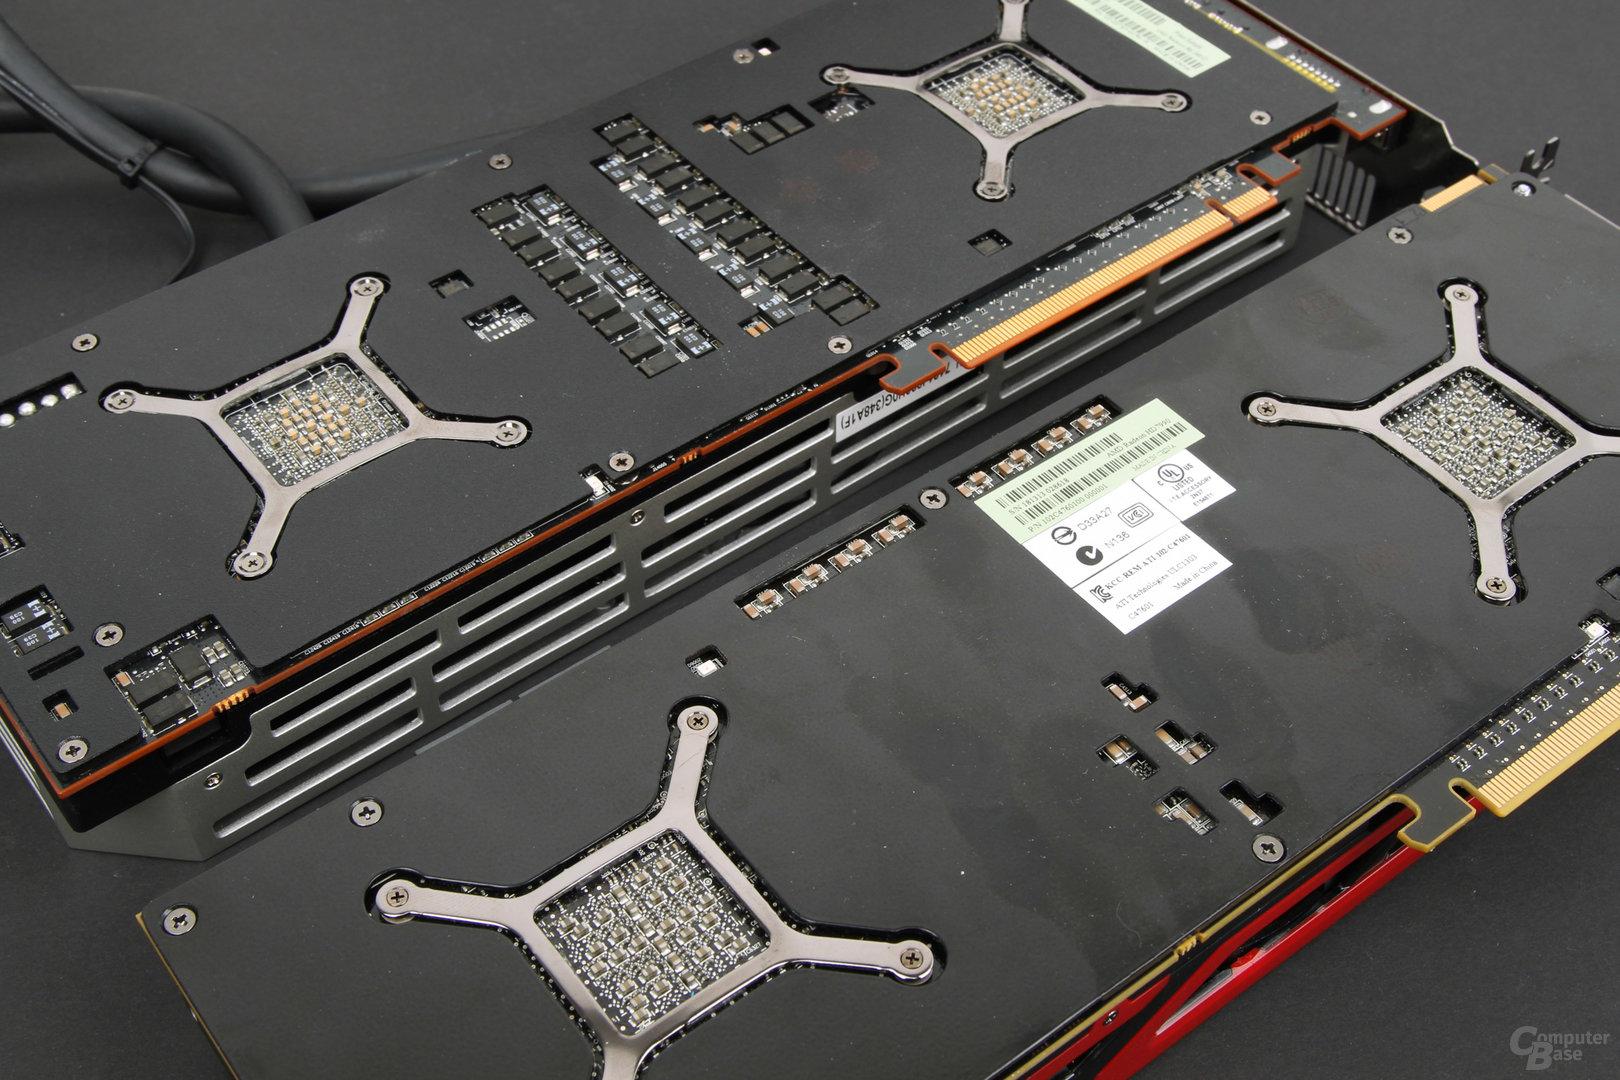 AMD Radeon R9 295X2 (oben) vs. Radeon HD 7990 - Rückseite